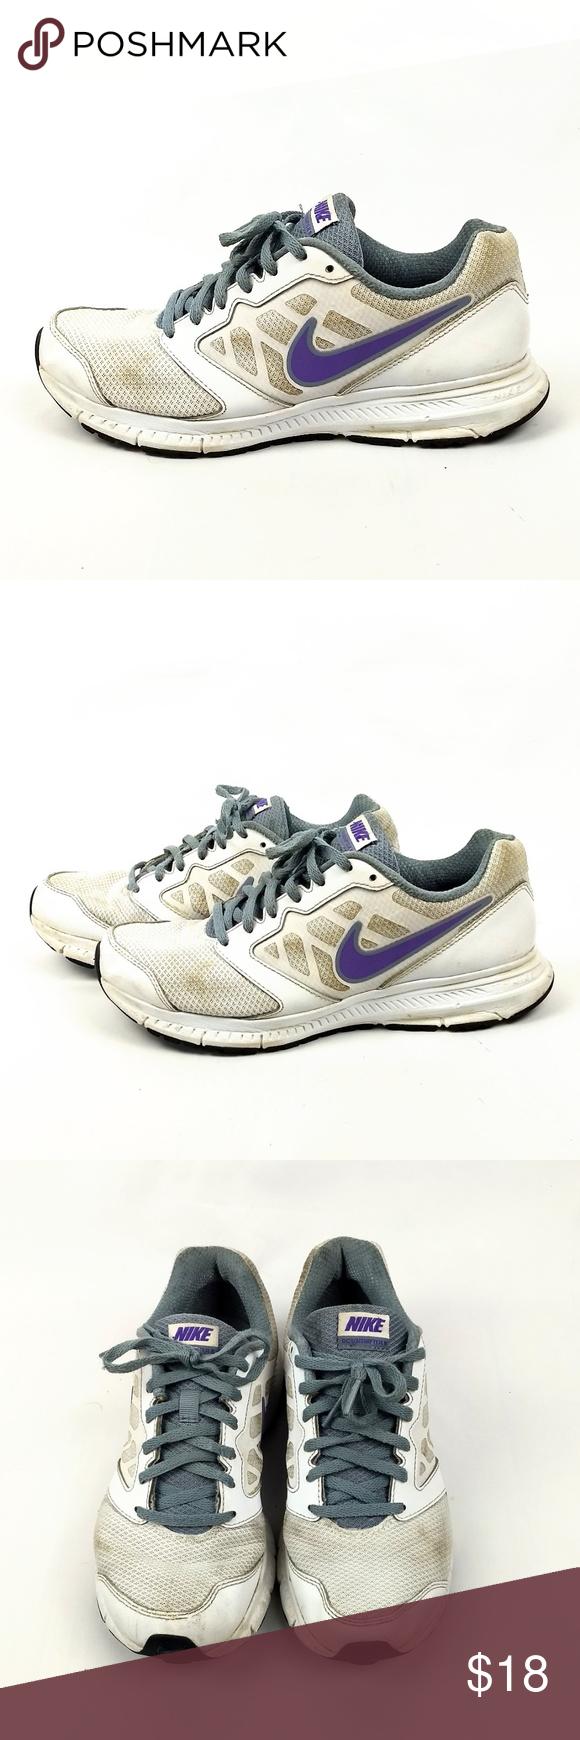 mizuno mens running shoes size 9 youth gold female women' figure